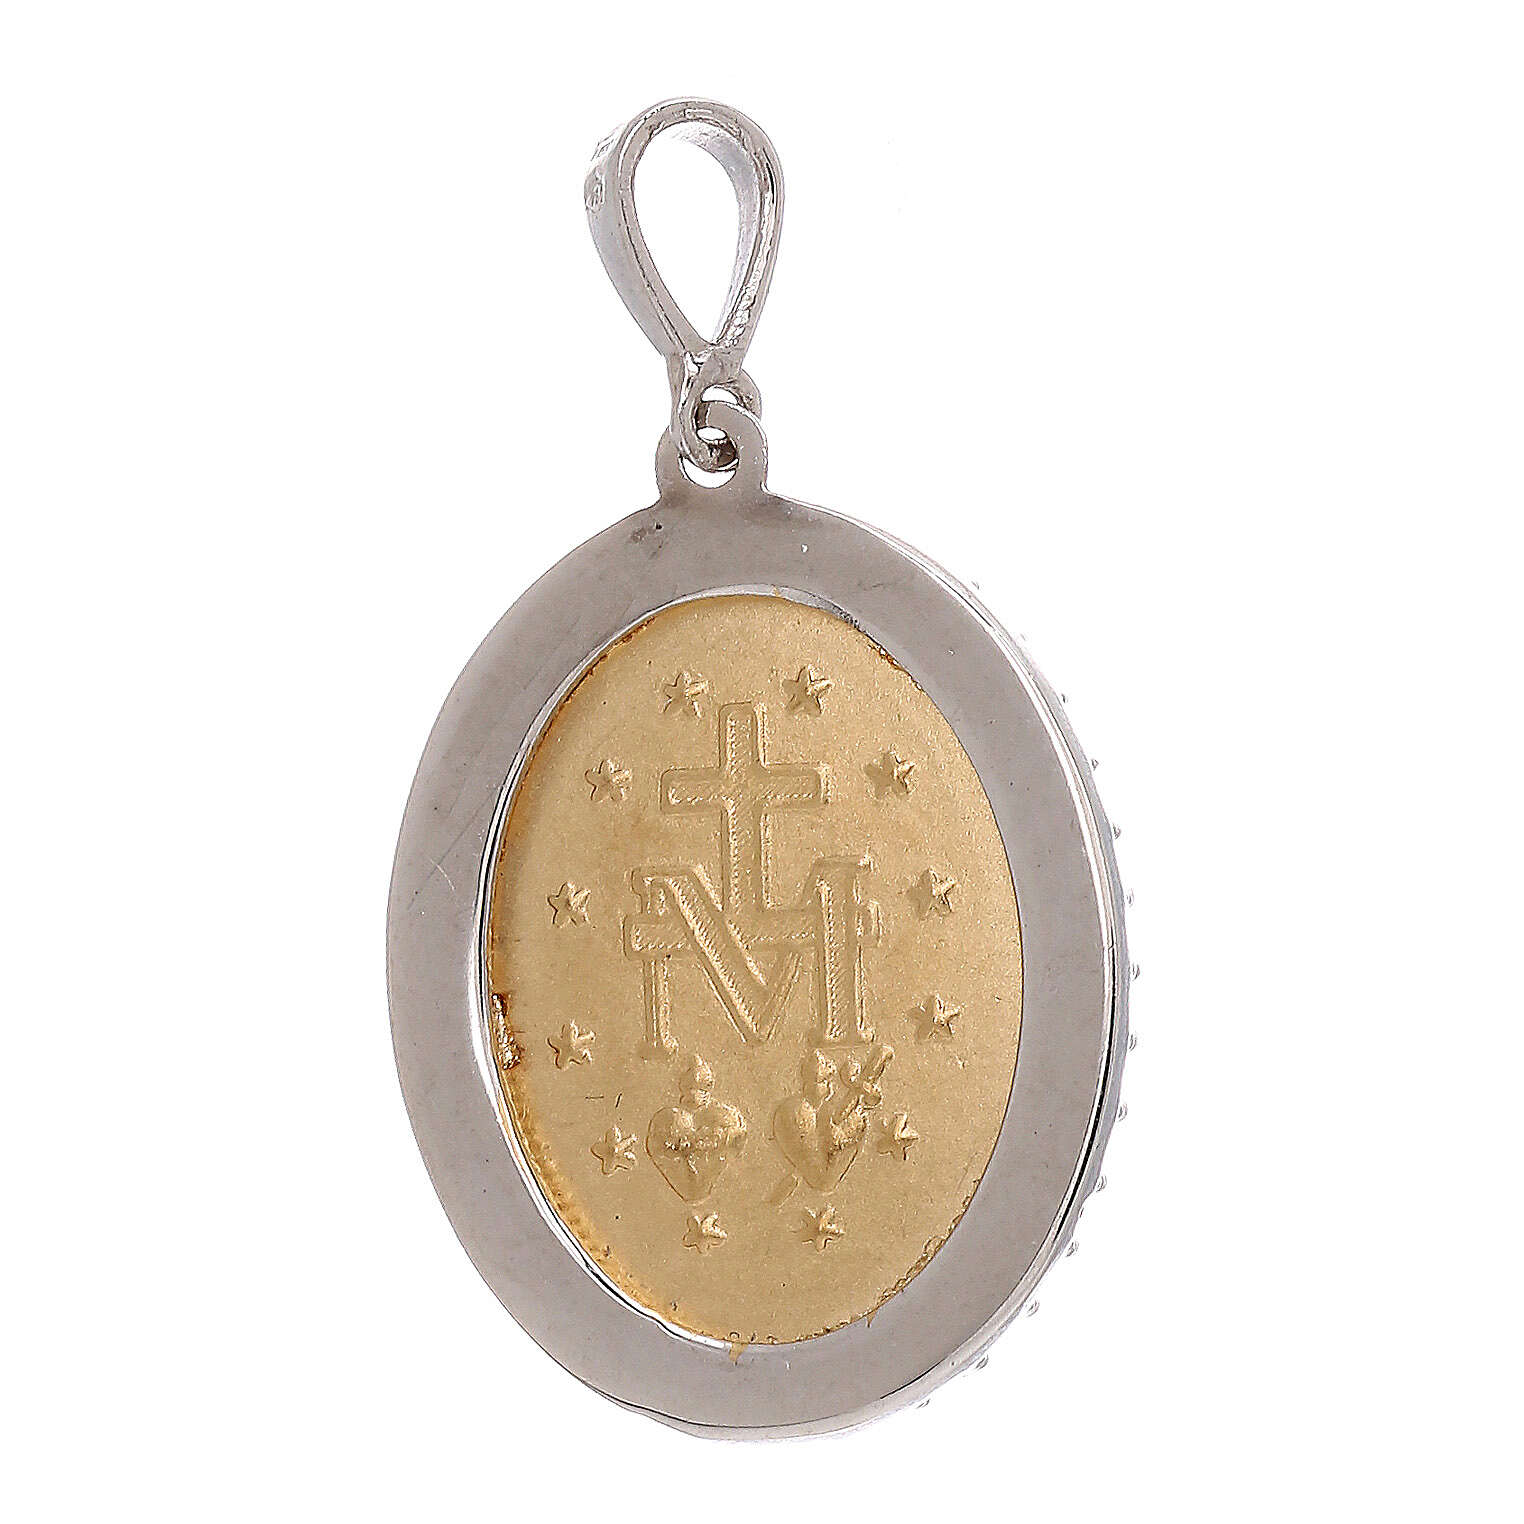 Colgante Medalla Milagrosa Swarovski rojos oro bicolor 18 k 3,4 gramos 4